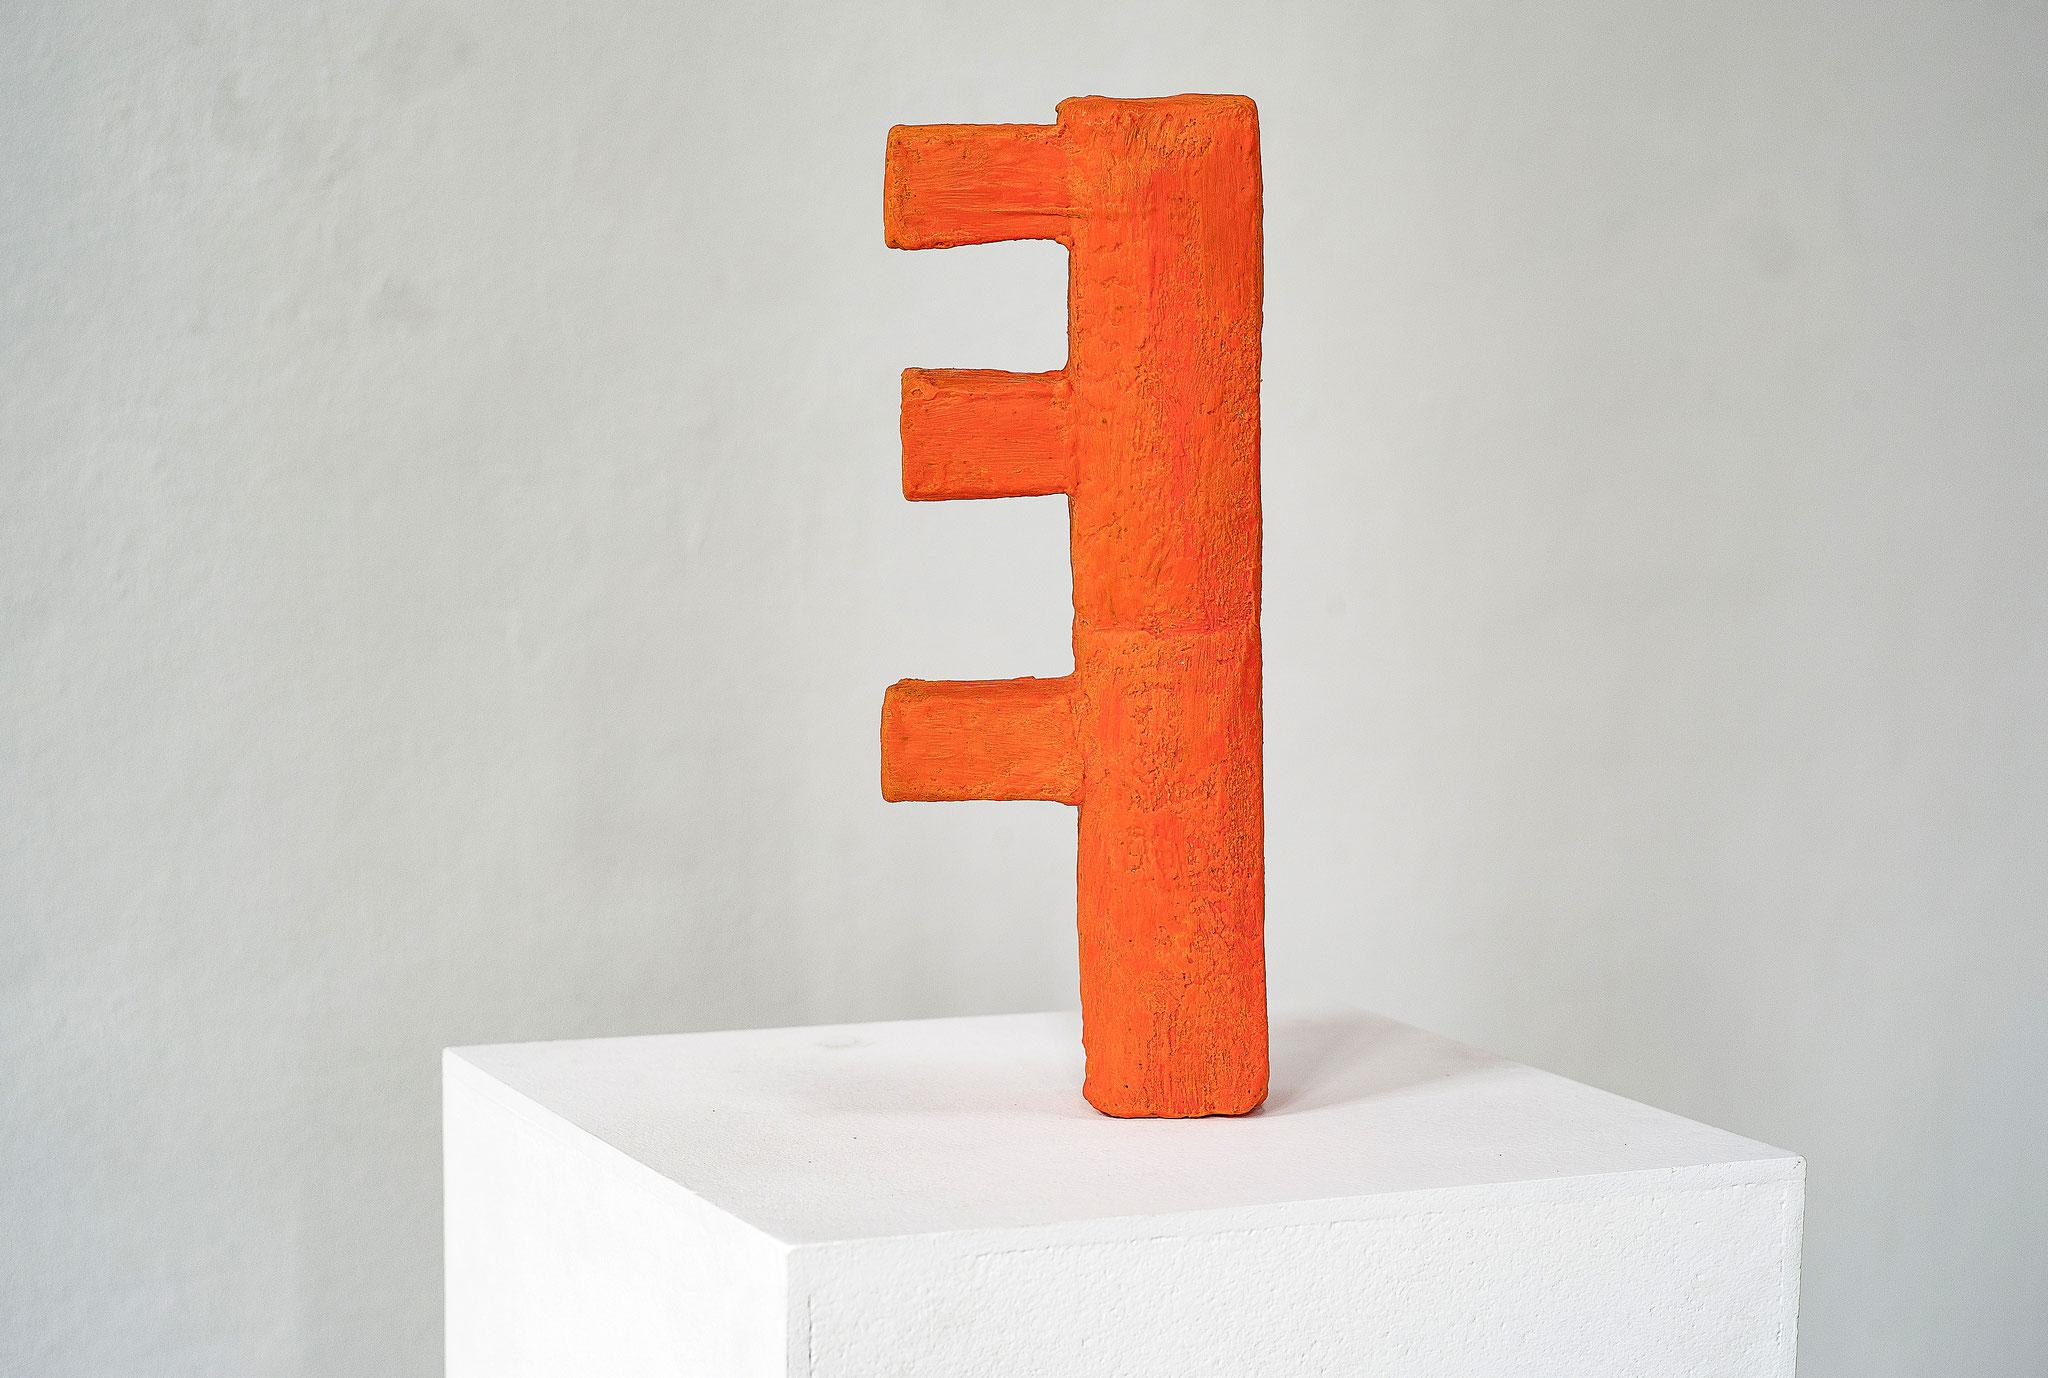 Schwarzbauten Nr.1 2016  Betonguss, Wachs, Pigment 14x 38x 8 cm